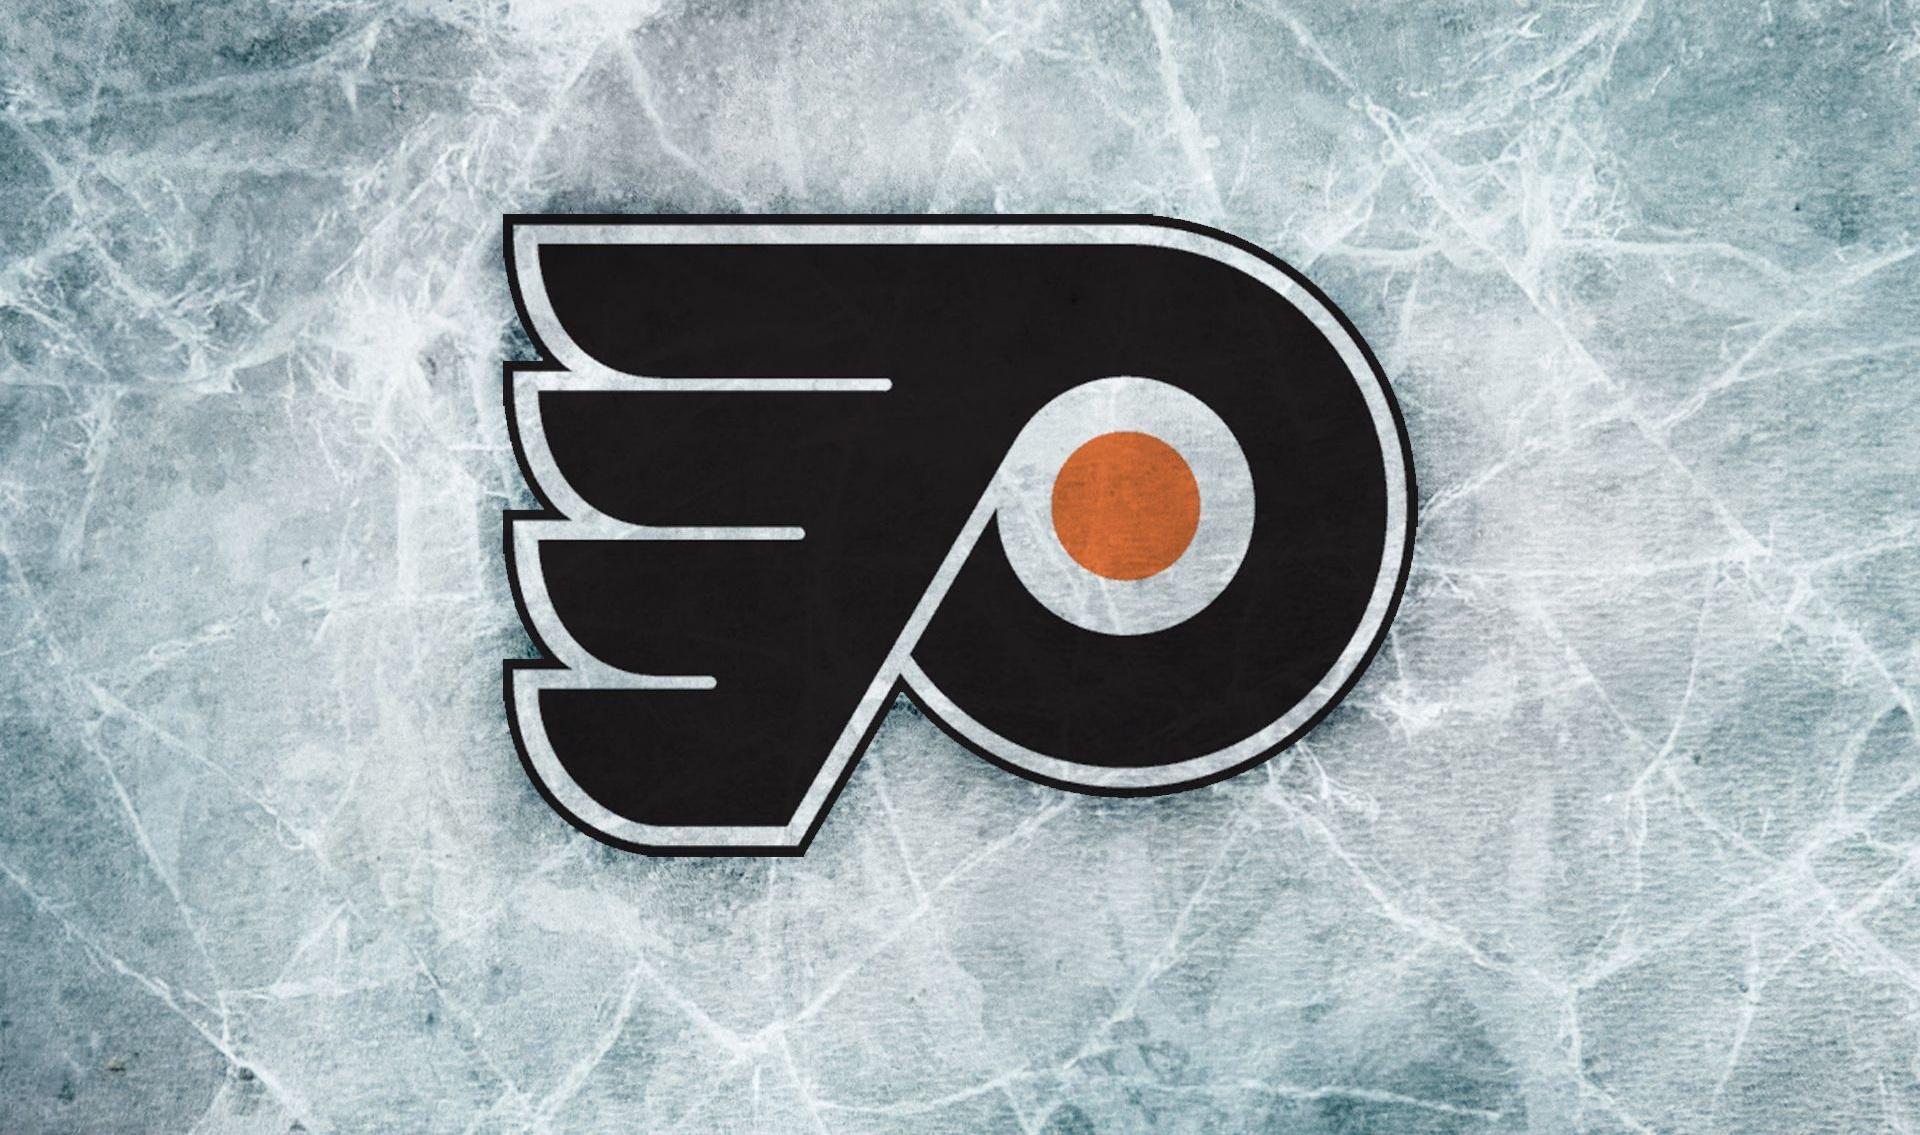 Philadelphia Flyers 4k